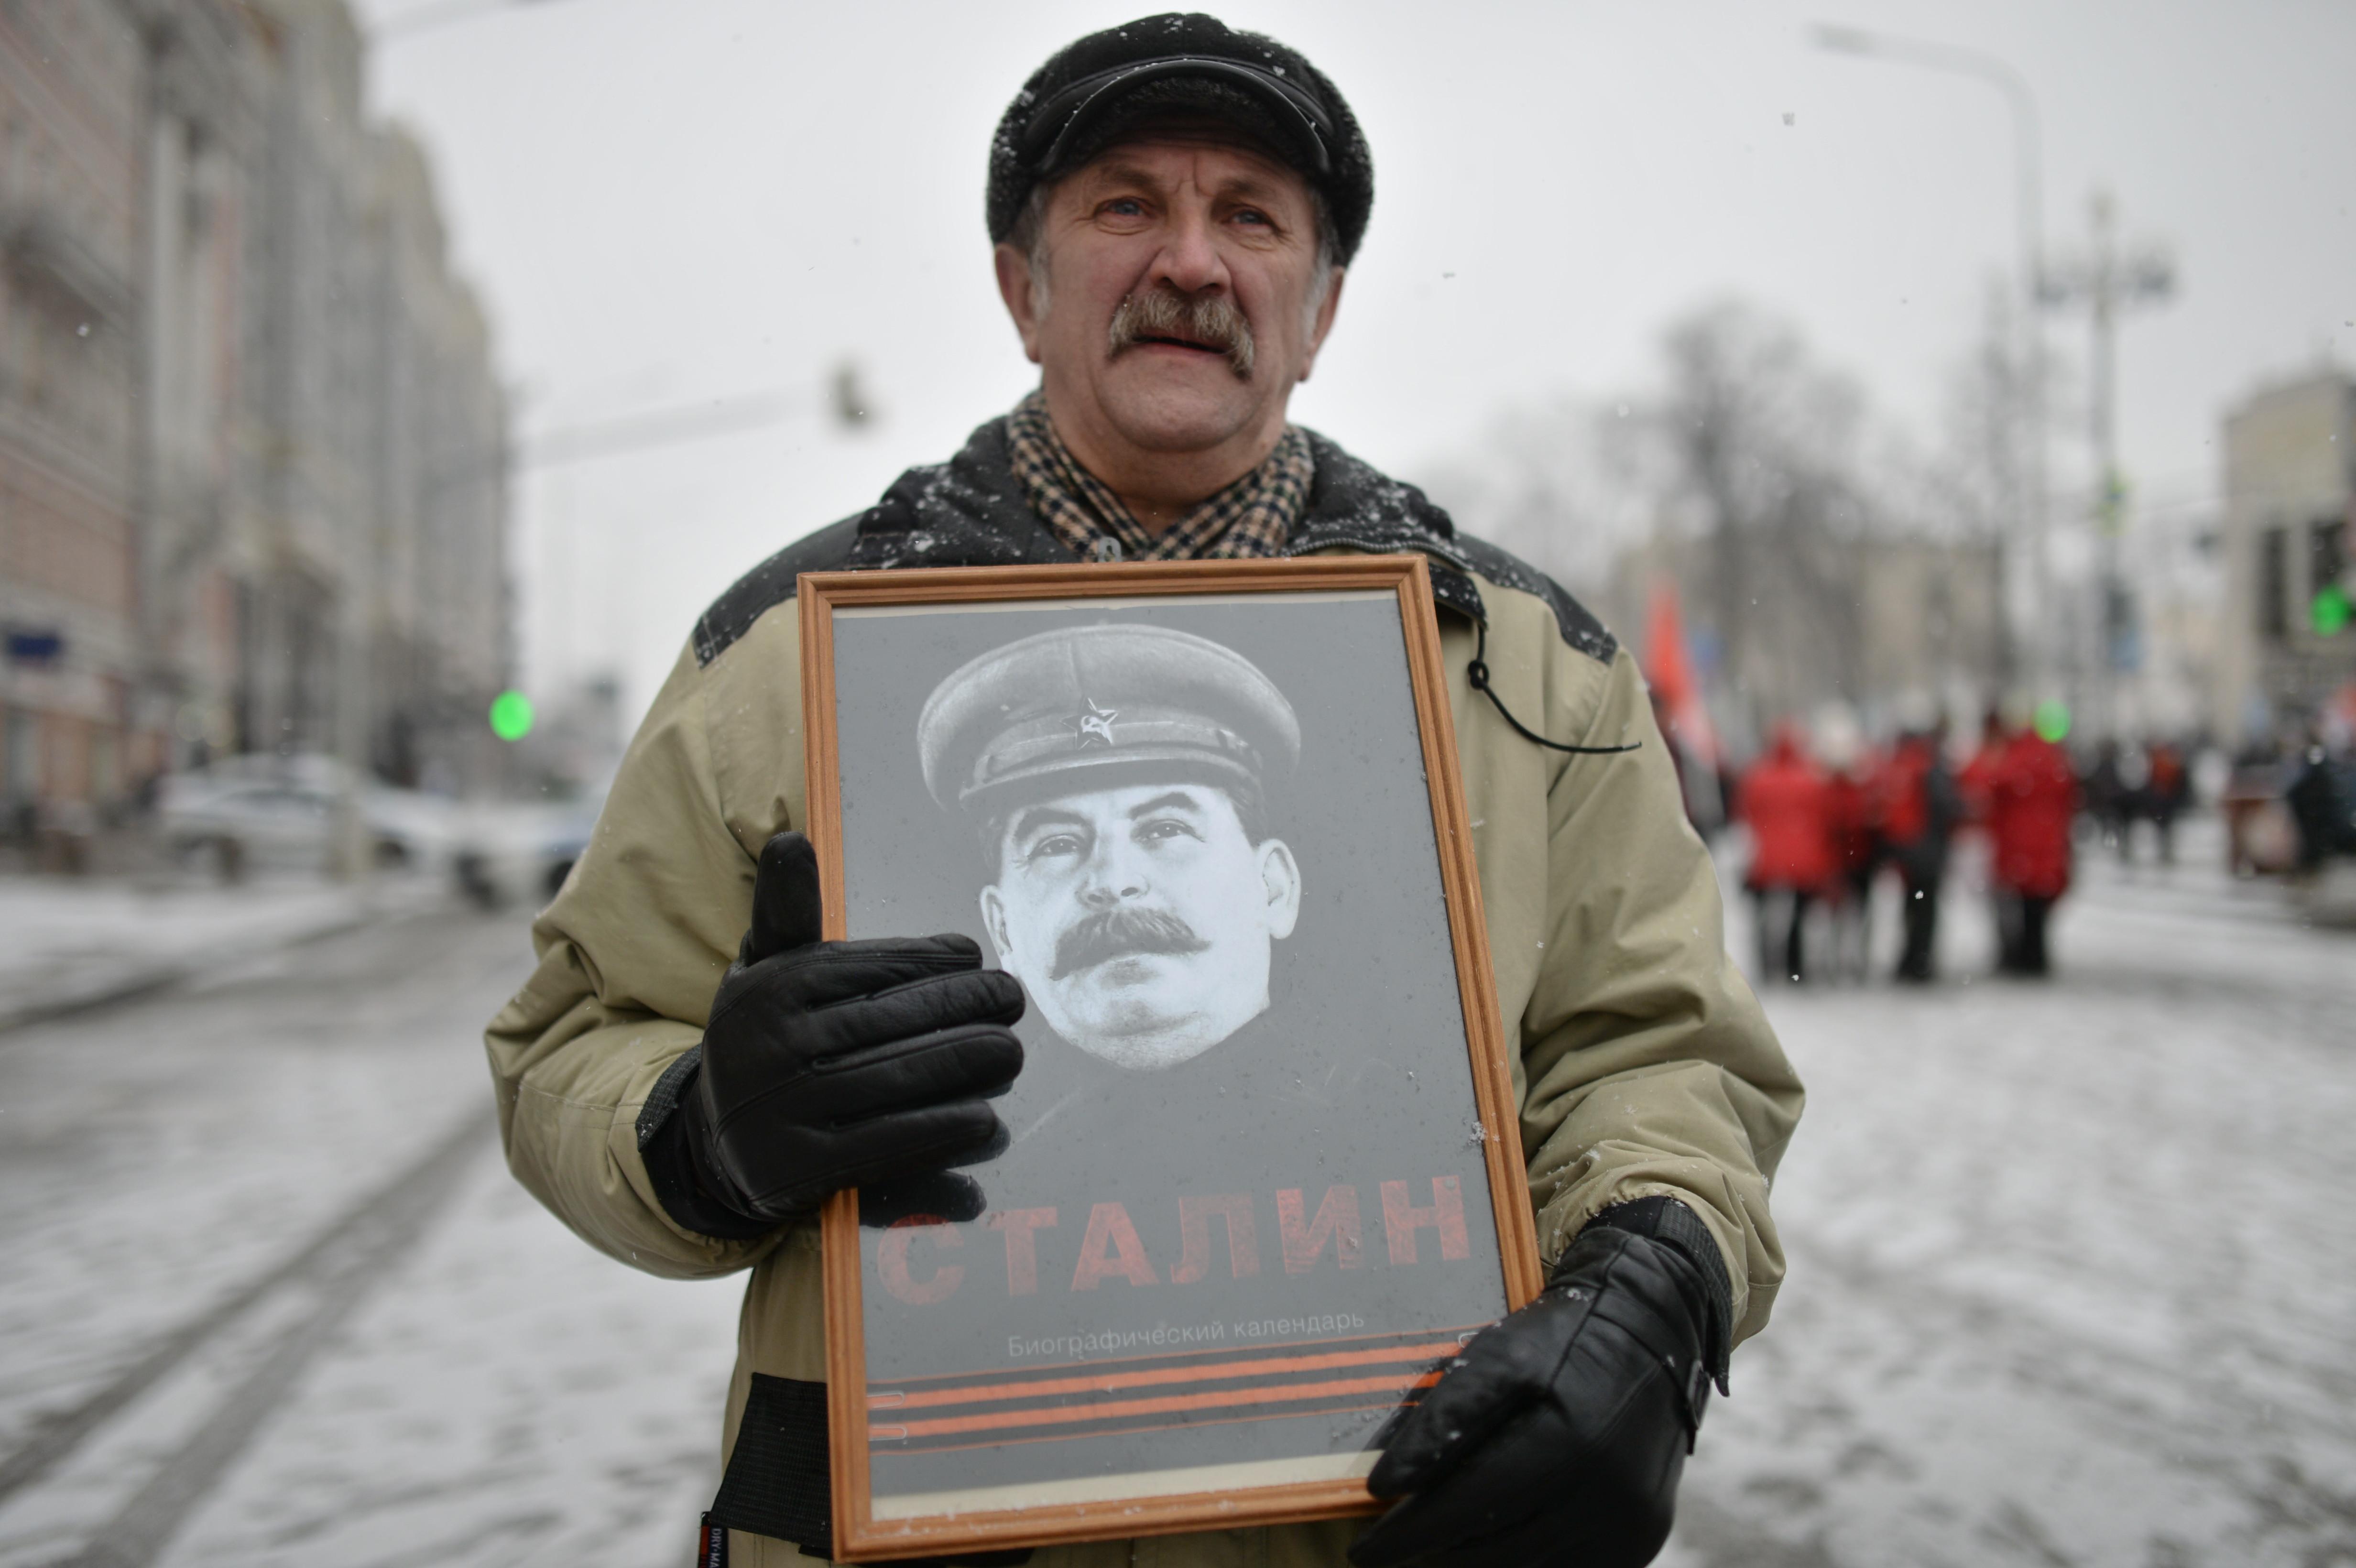 <p>Фото: &copy;РИА Новости /&nbsp;Илья Питалев</p>